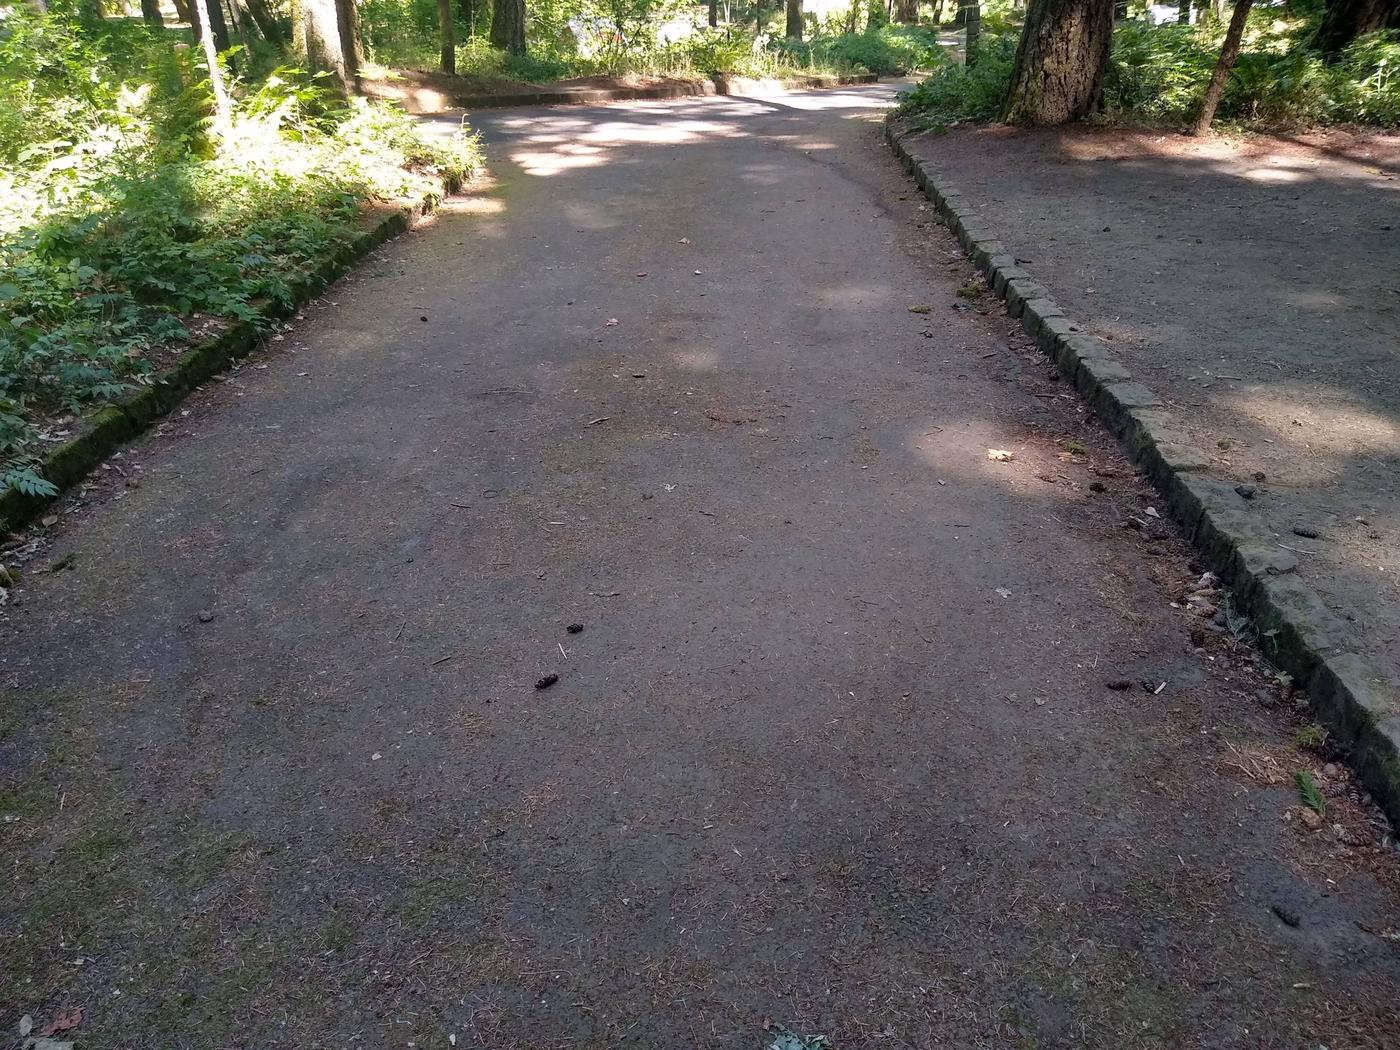 Driveway towards Loop RoadSite #8-Wyeth Campground